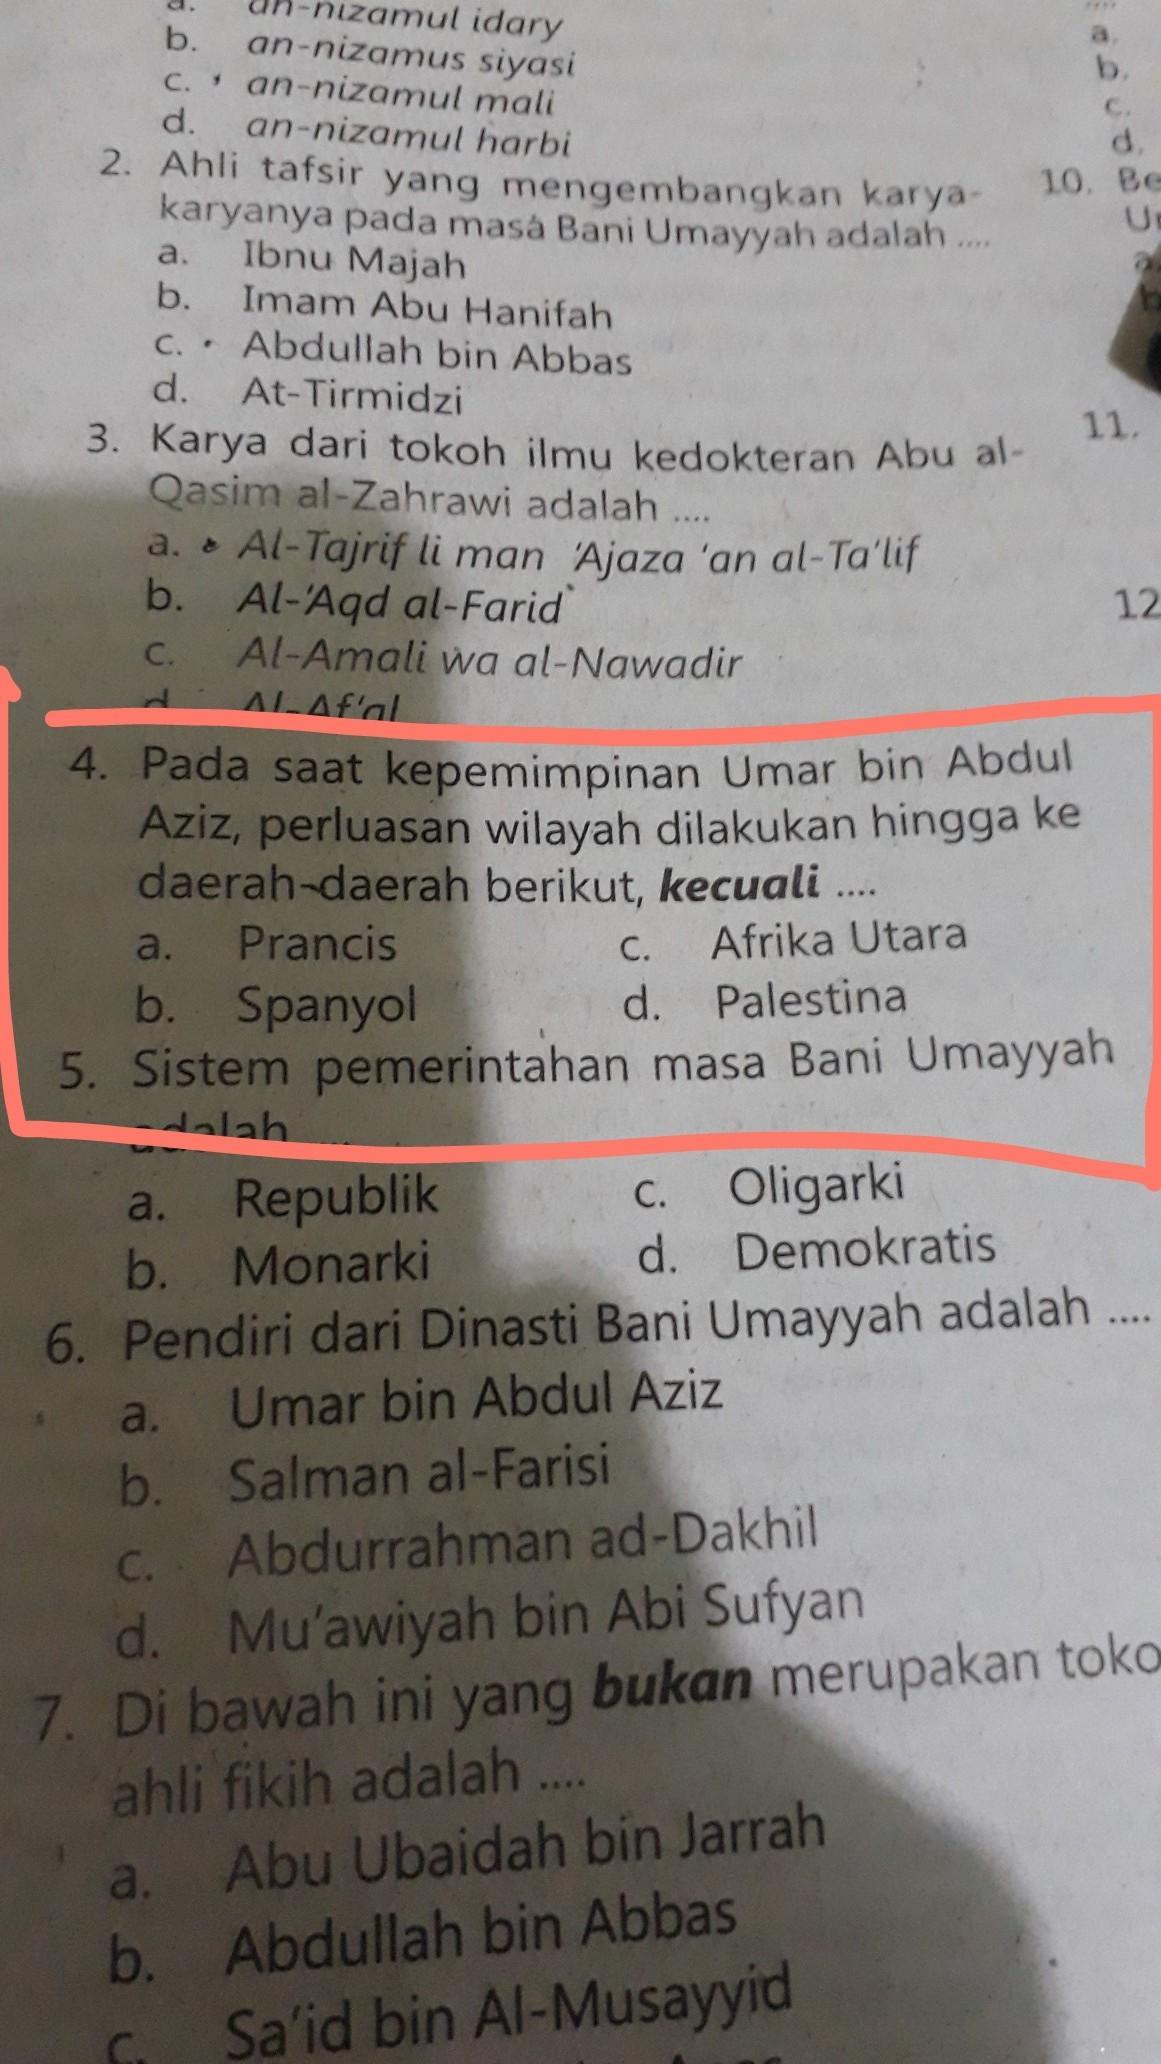 Kepemimpinan Umar Bin Abdul Aziz : kepemimpinan, abdul, Kepemimpinan, Abdul, Aziz,, Perluasan, Wilayah, Dilakukan, Hingga, Daerah, Brainly.co.id